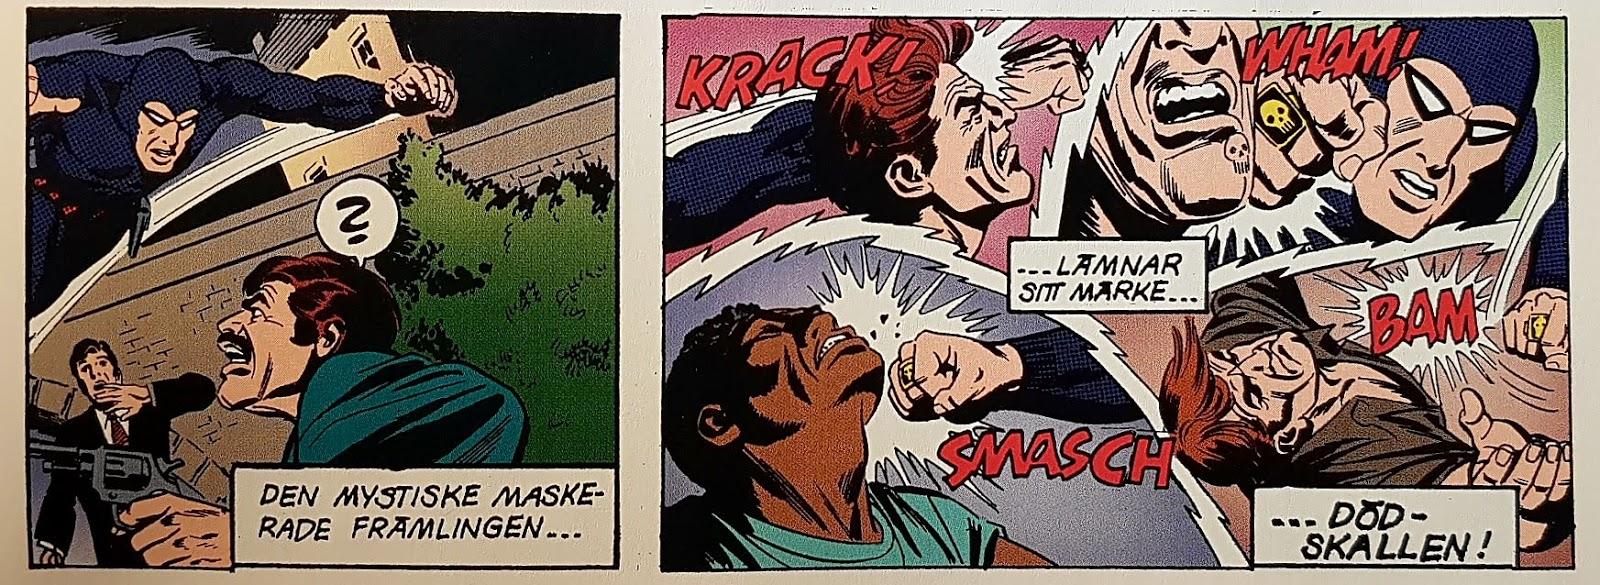 Svenska dejtingregler